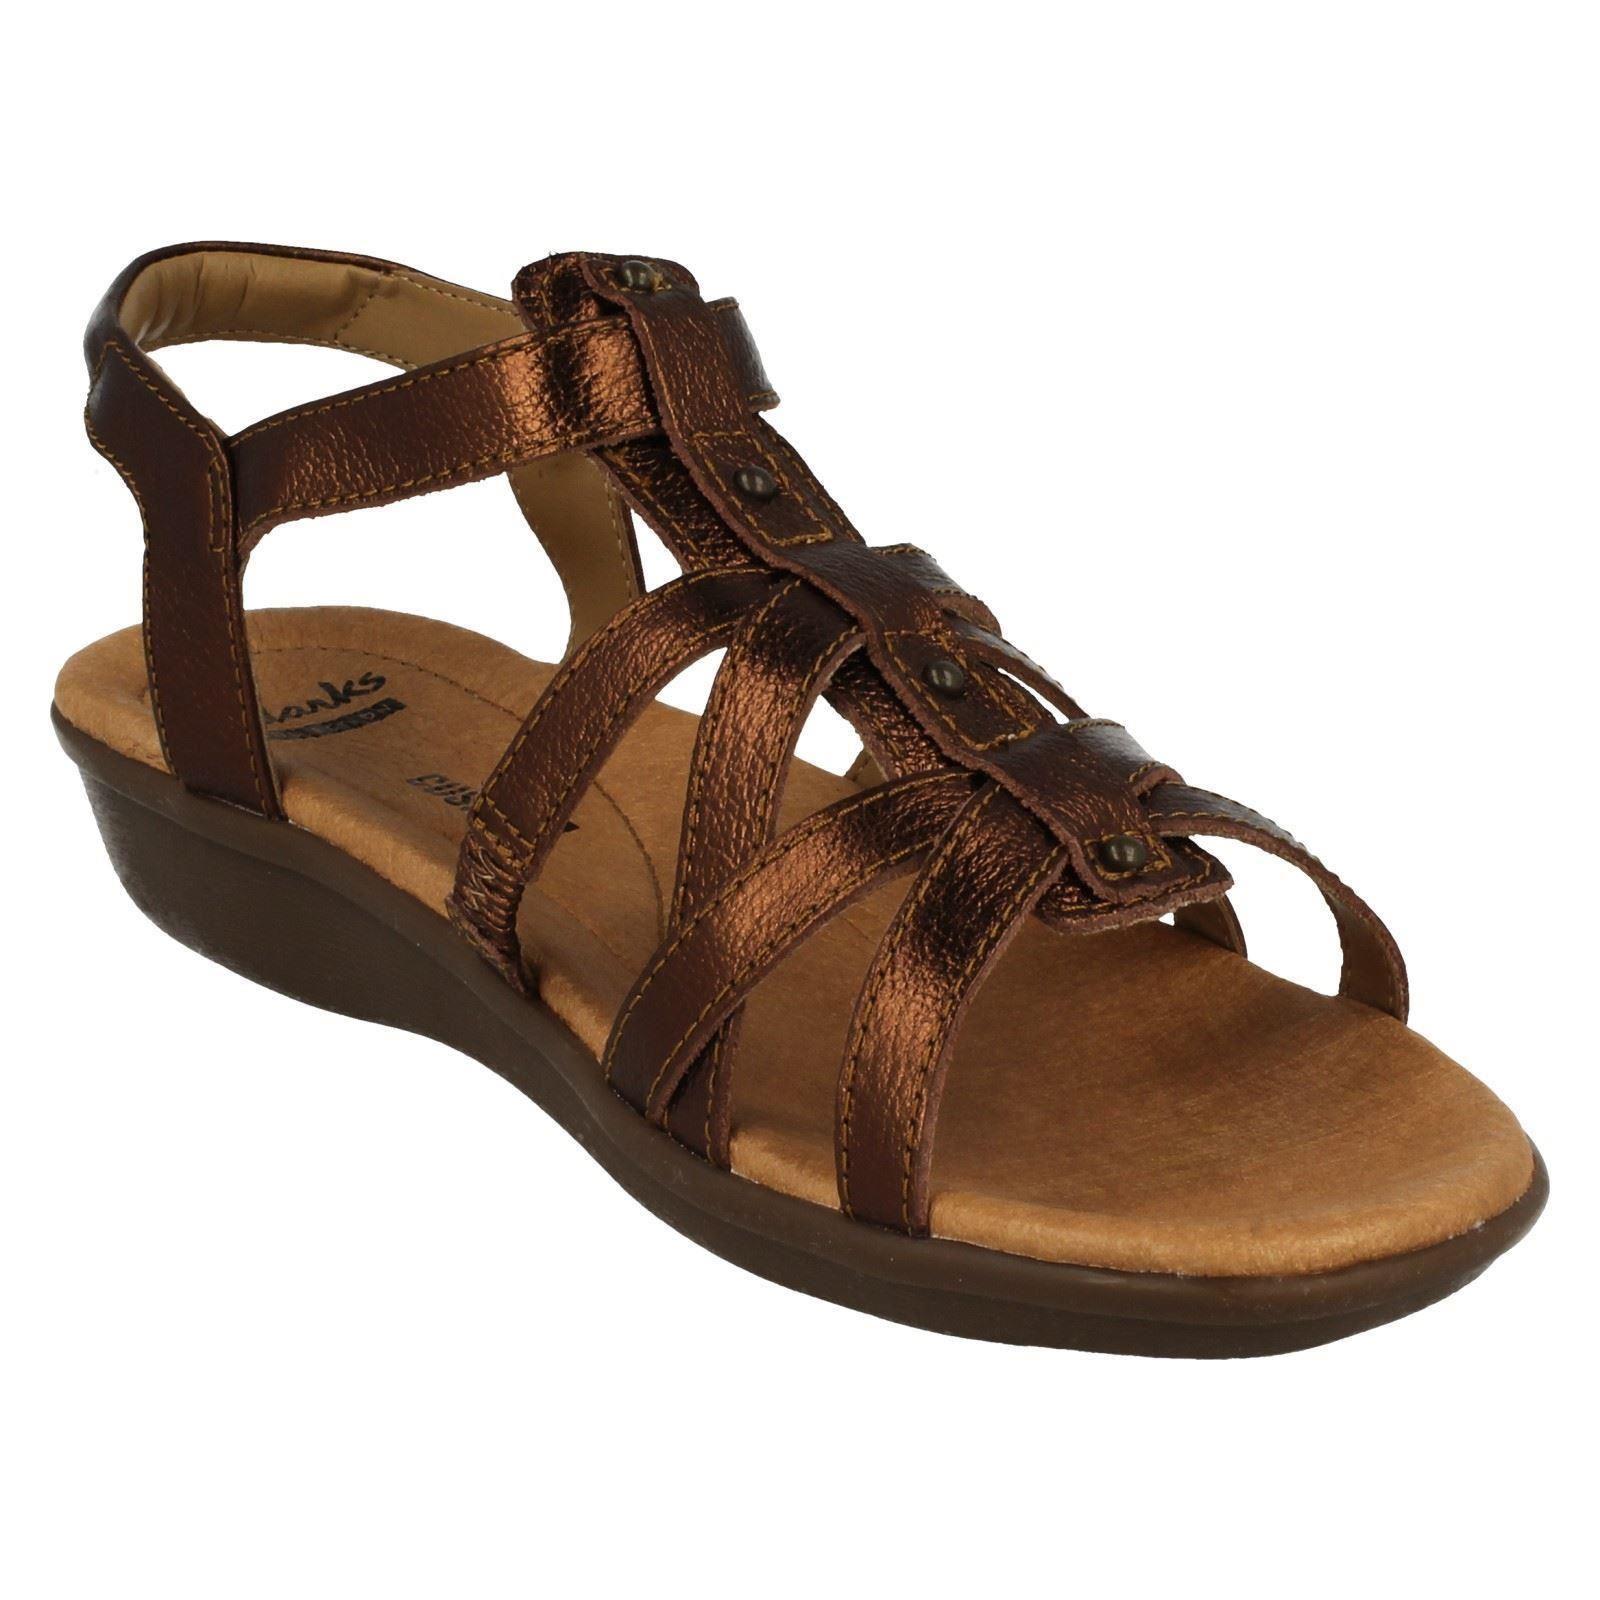 ebe78b26cc0 Womens-Clarks-Gladiator-Style-Sandals-Manilla-Bonita thumbnail 14